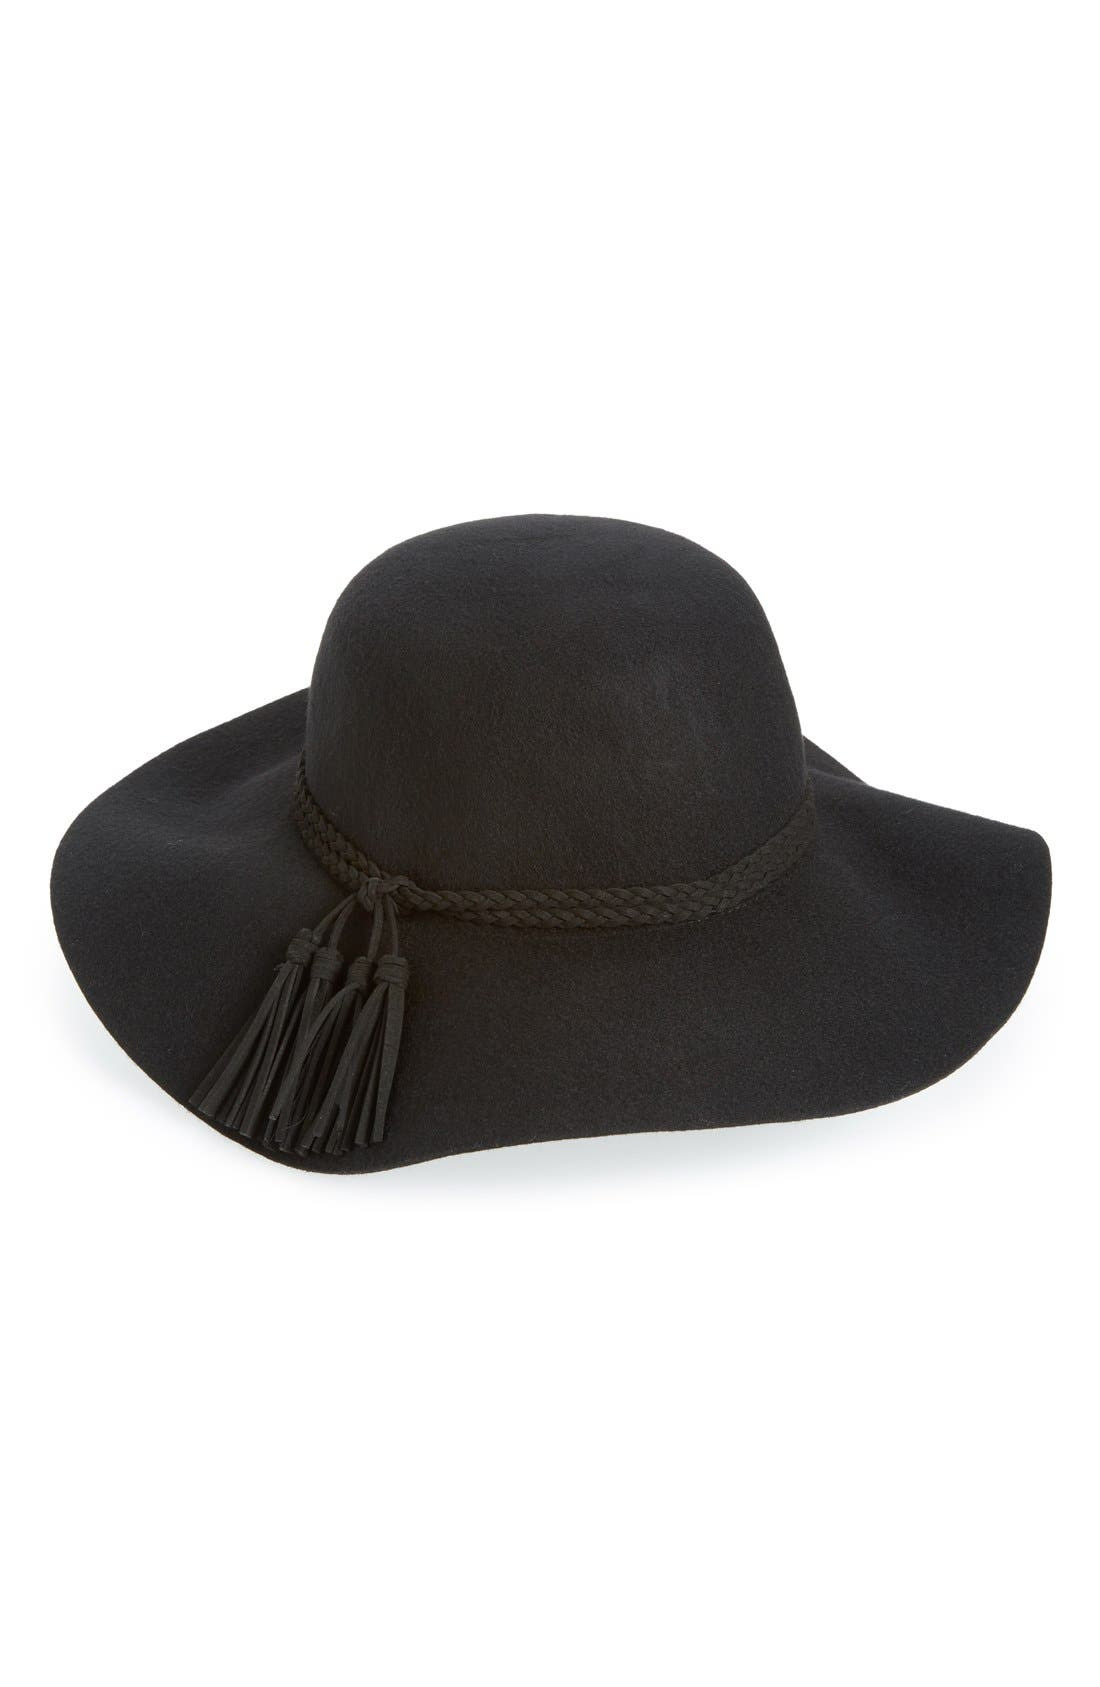 PHASE 3 Tassel Band Floppy Hat, Main, color, 001